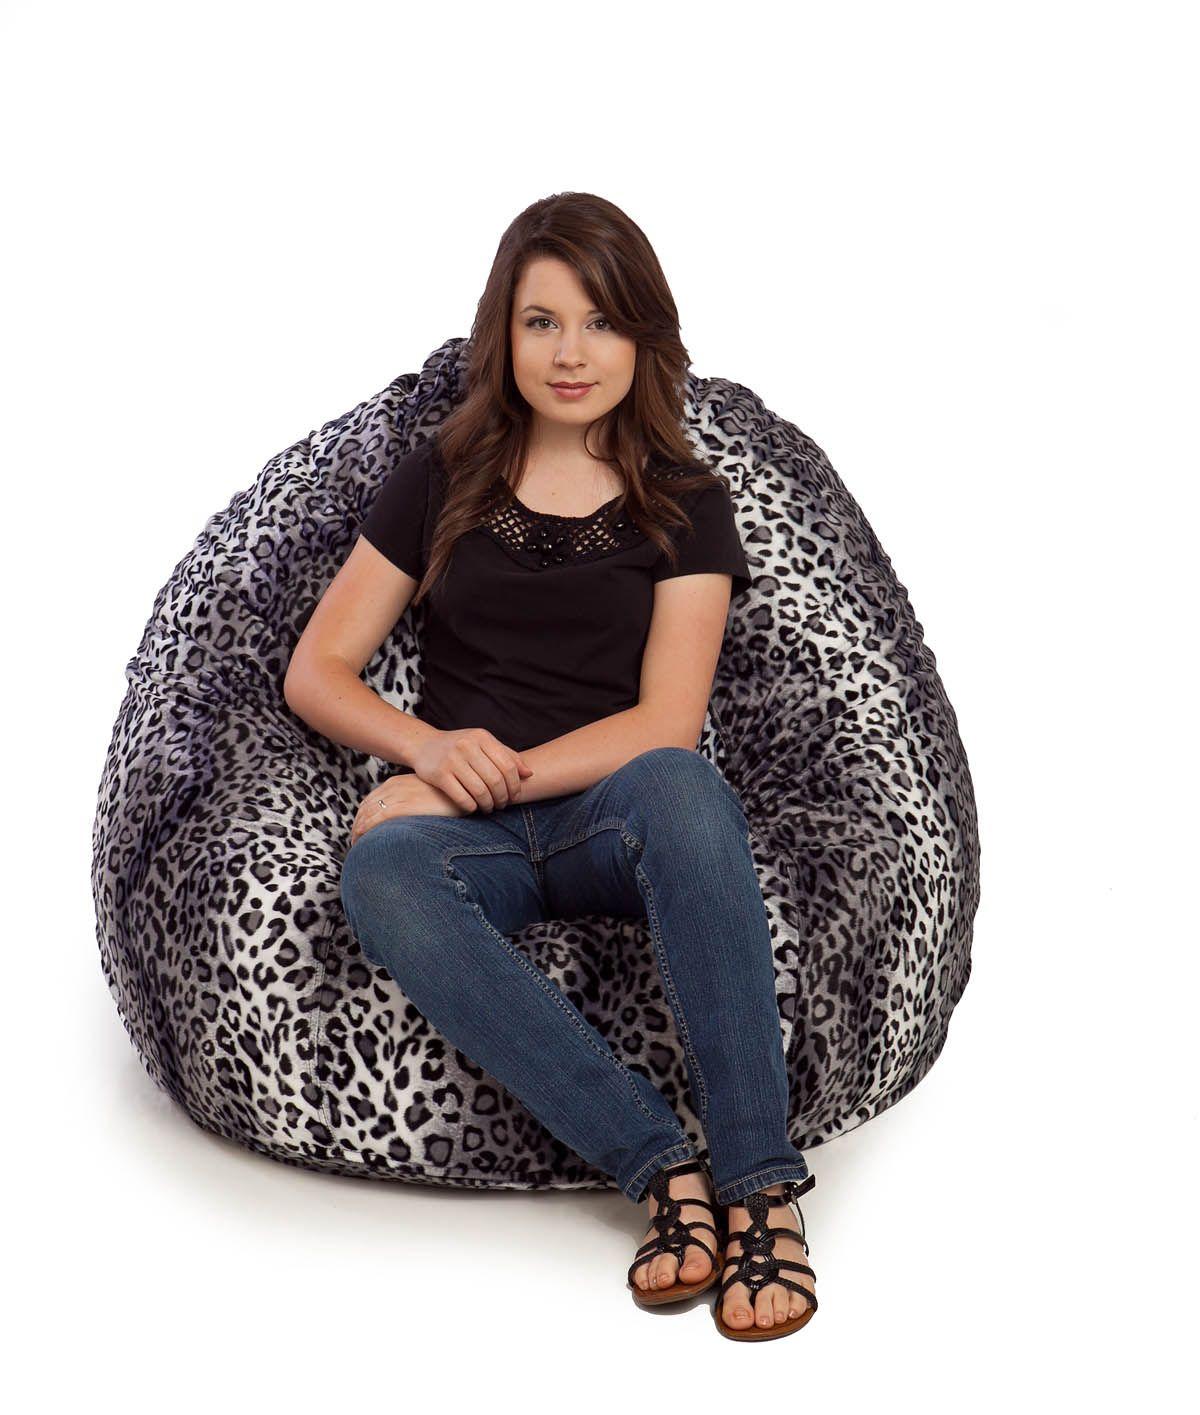 Groovy Snow Cheetah Fur Bean Bag Chair Large Large Bean Bag Evergreenethics Interior Chair Design Evergreenethicsorg